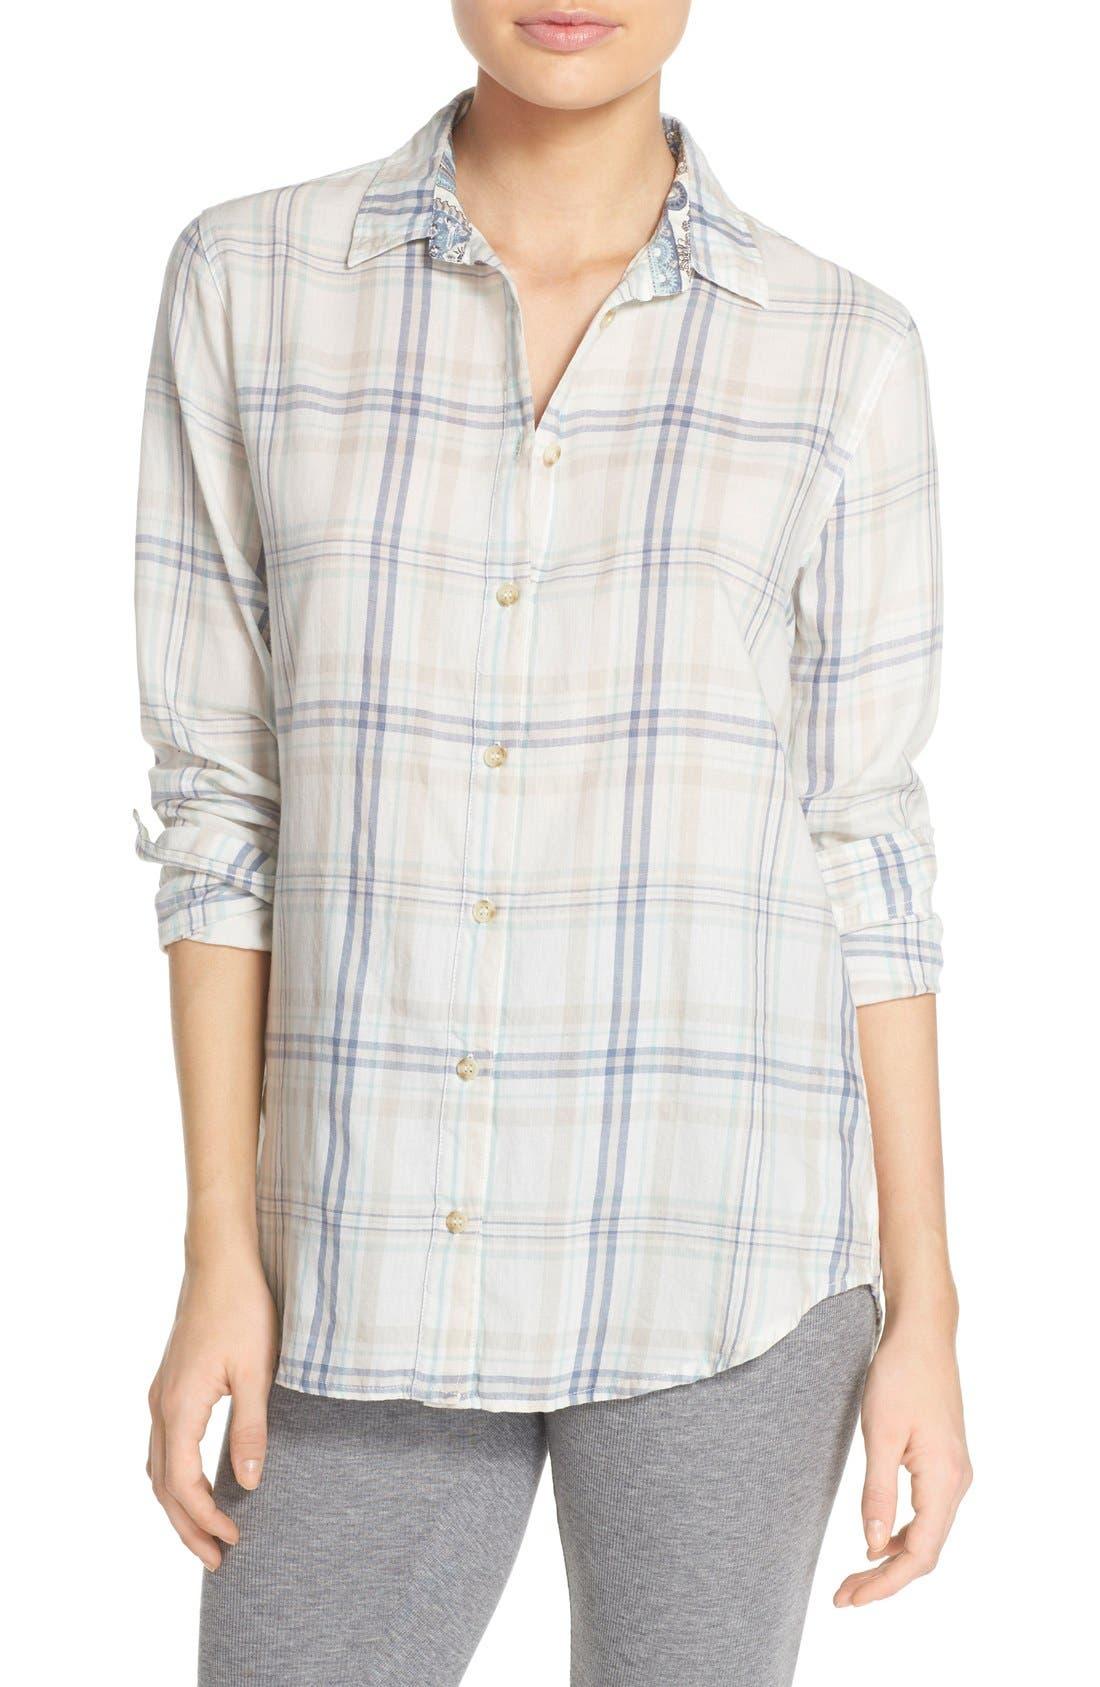 Main Image - PJ Salvage Plaid Cotton Twill Shirt